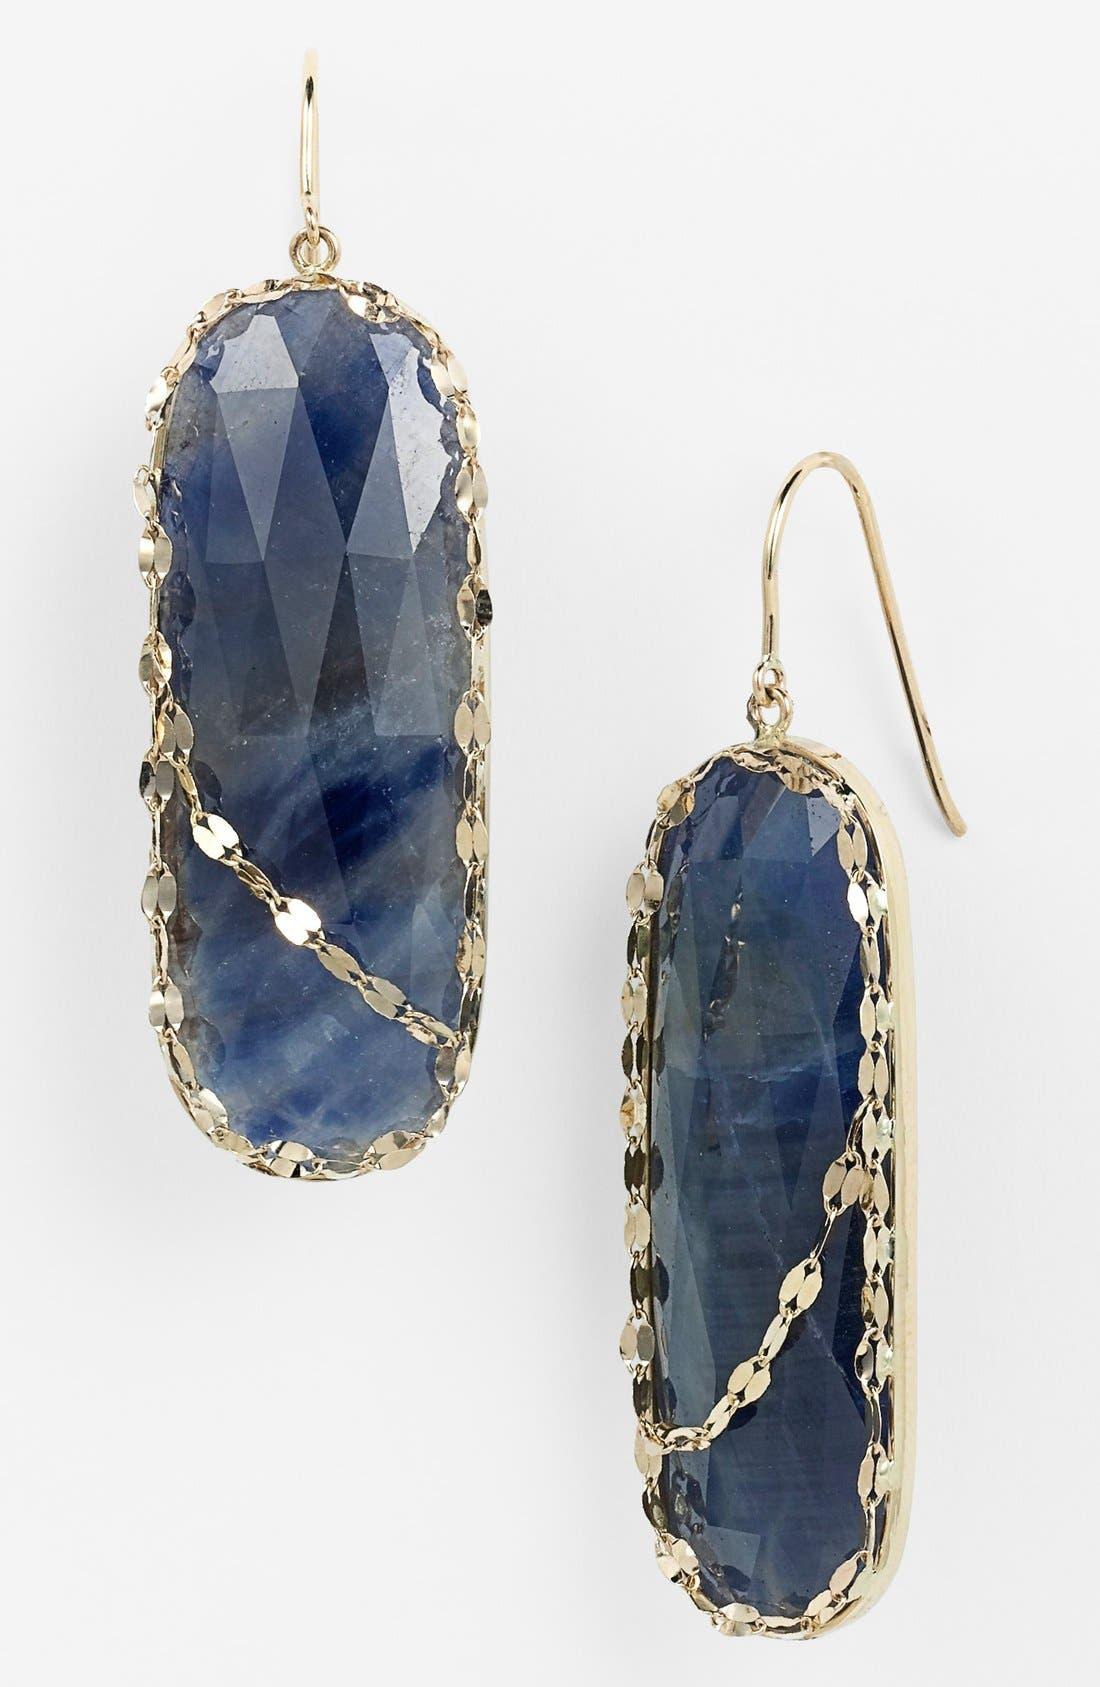 Main Image - Lana Jewelry 'Stone Gold' Sapphire Drop Earrings